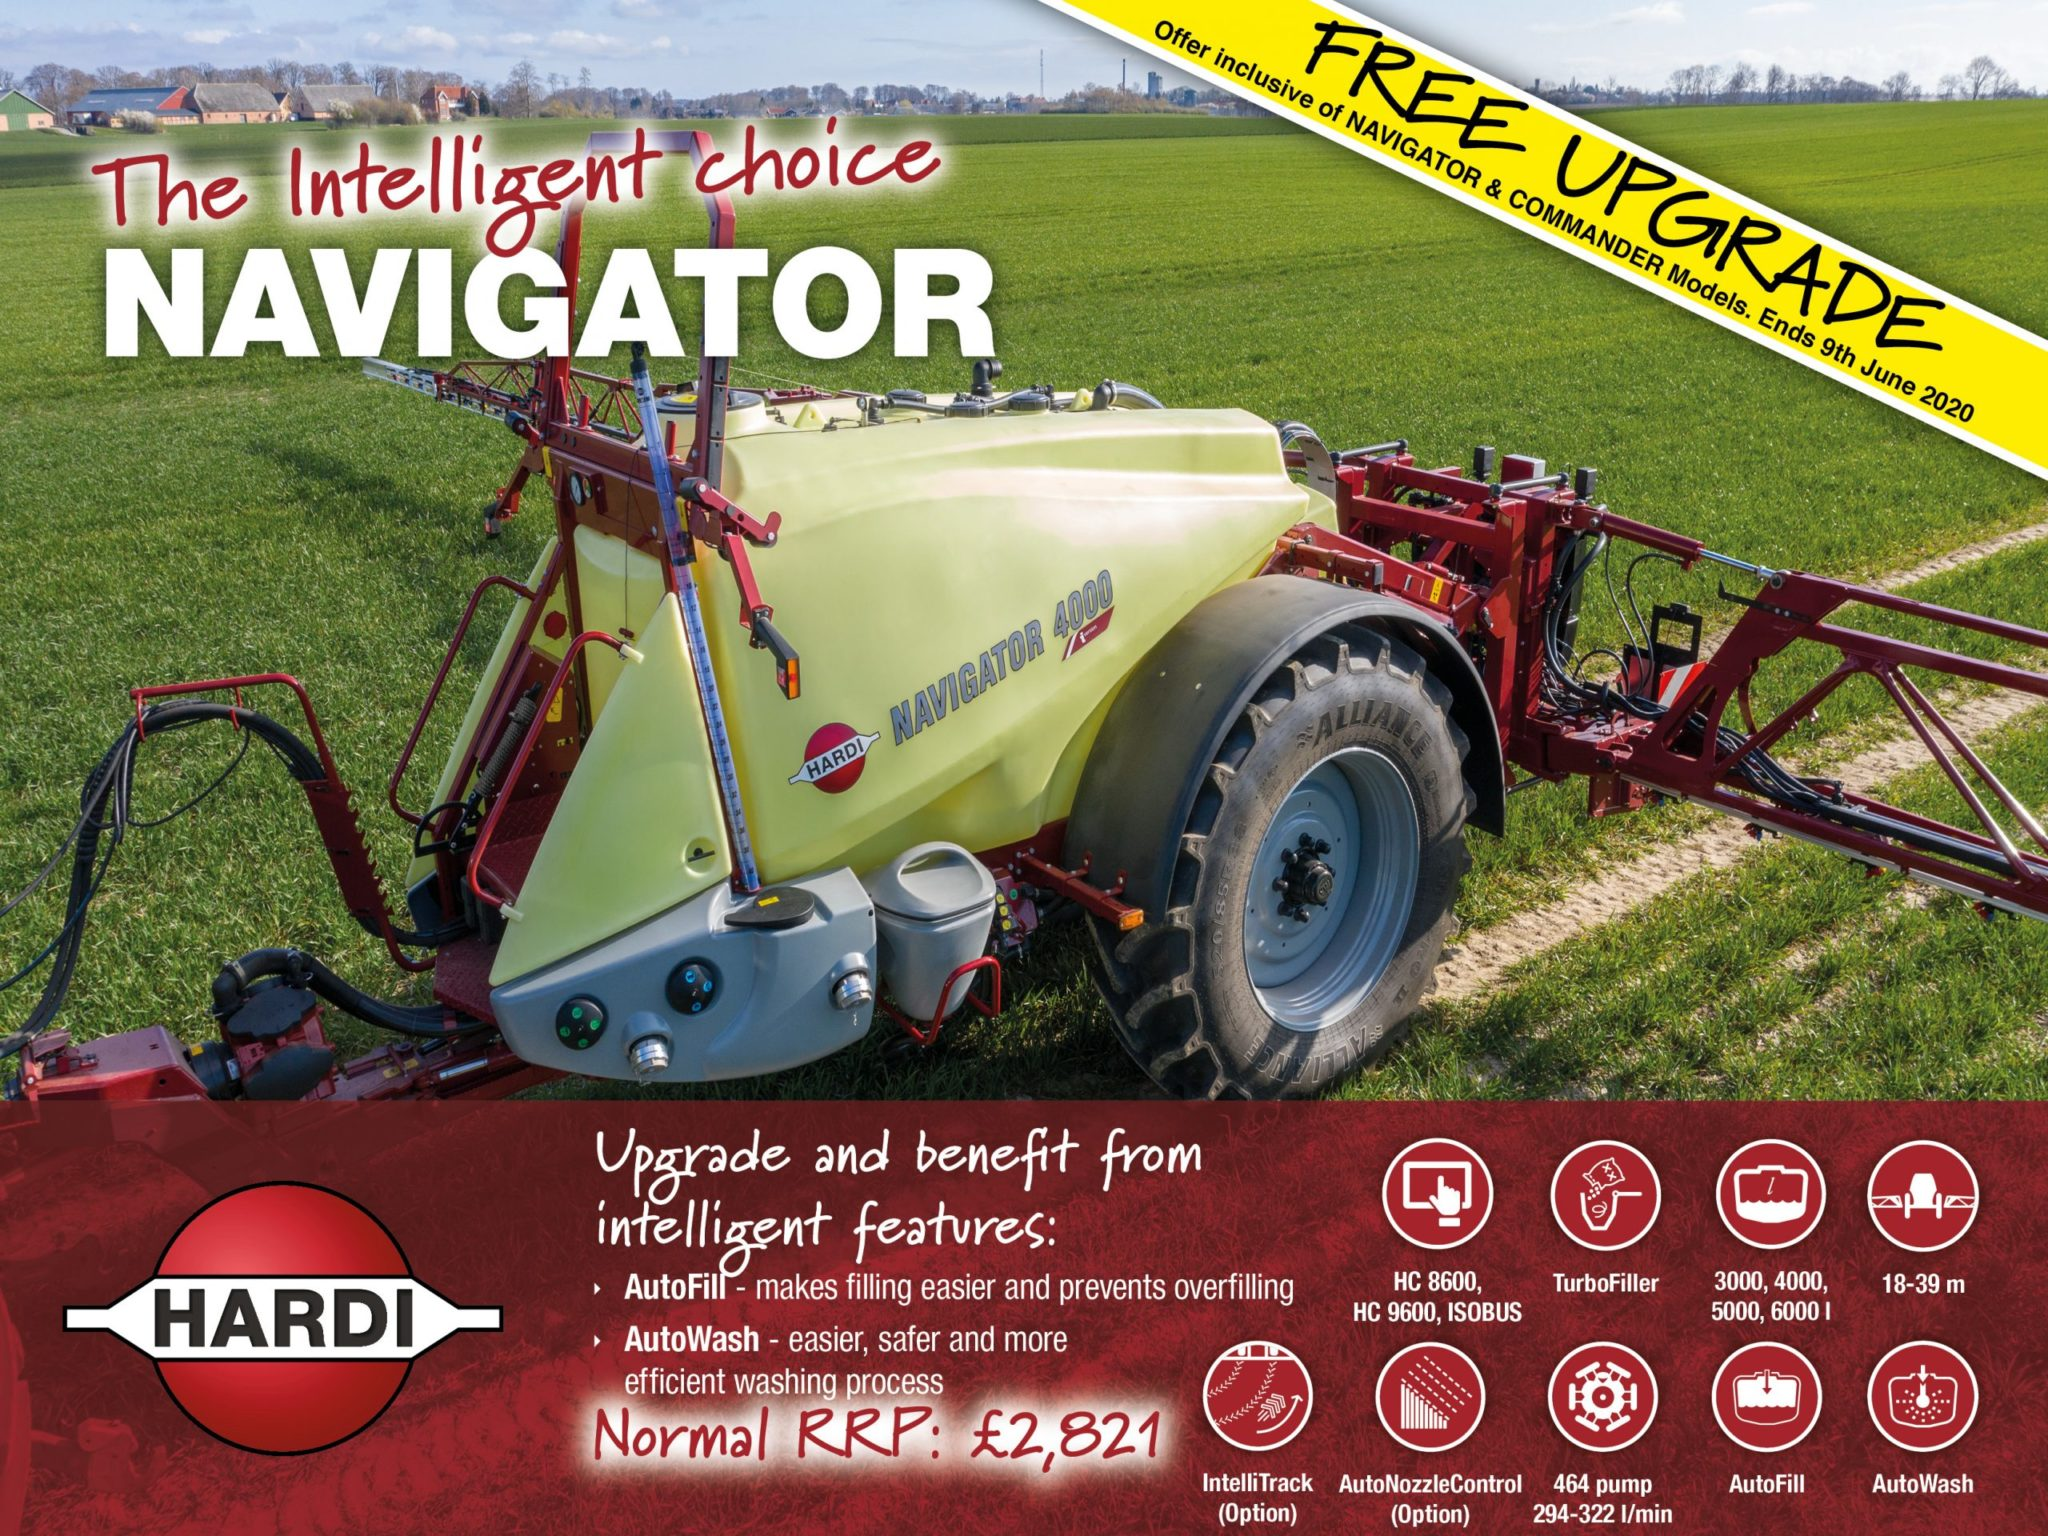 Hardi Navigator - Free Upgrade